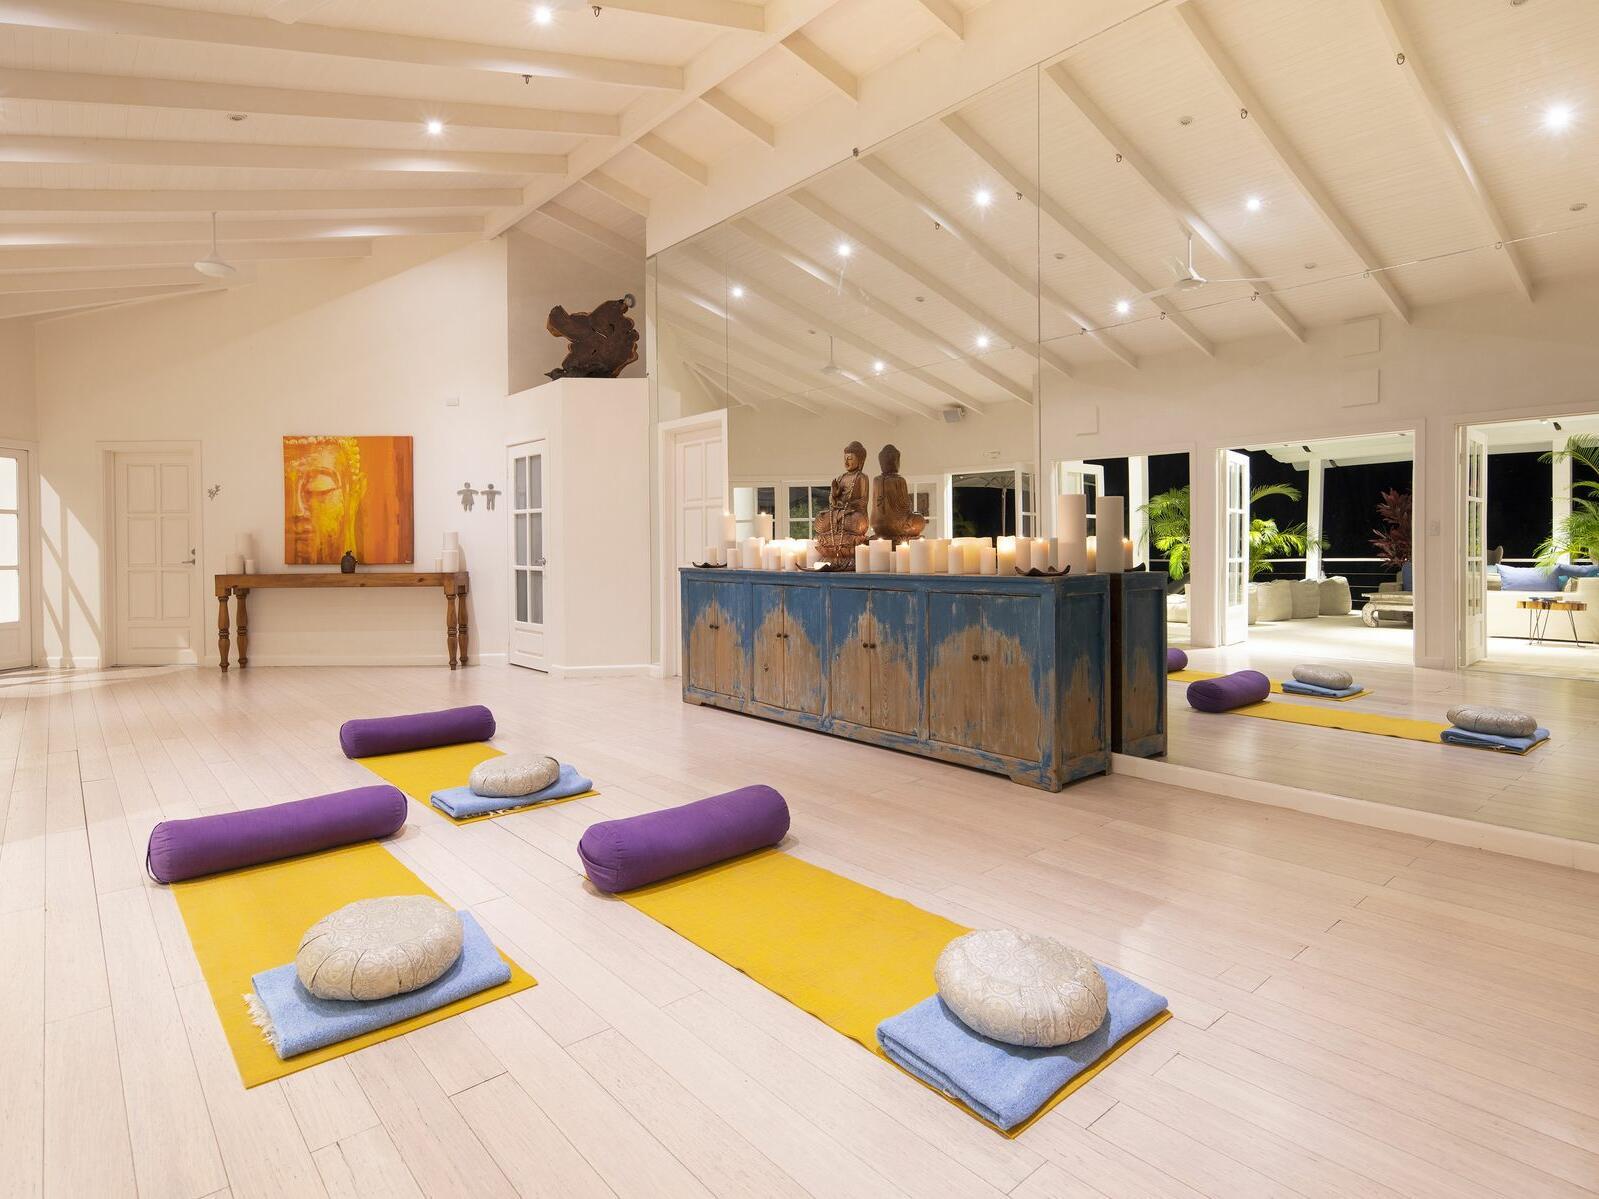 yoga studio with mats and pillows